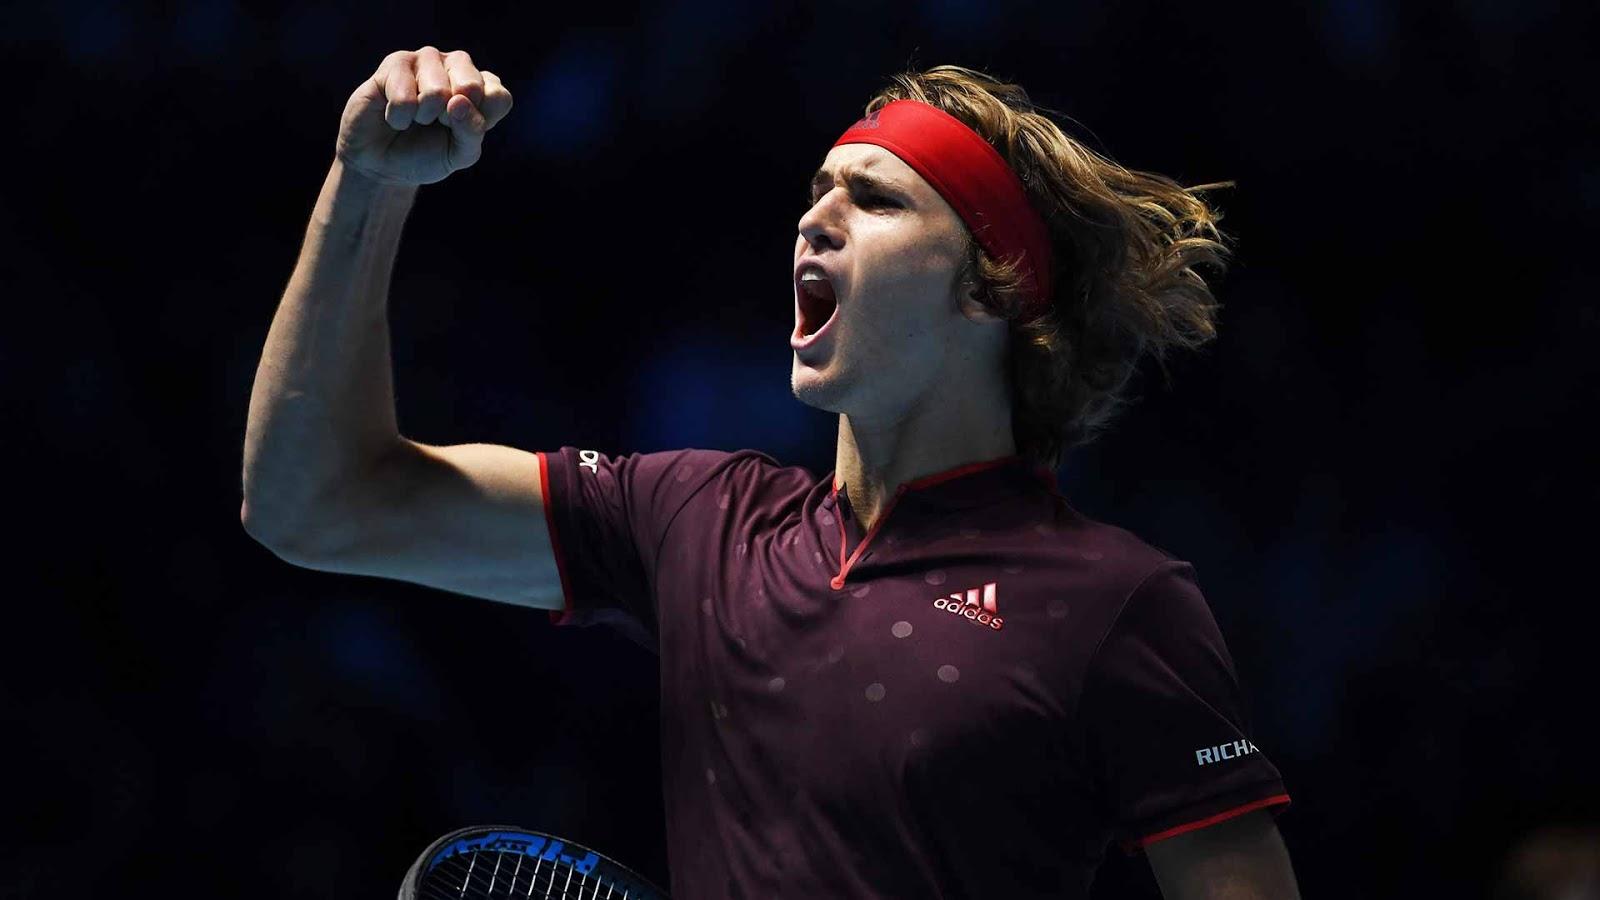 ATP-Finals-Federer-danh-bai-Jack-Sock-Alexander-Zverev-vuot-qua-Marin-Cilic-2